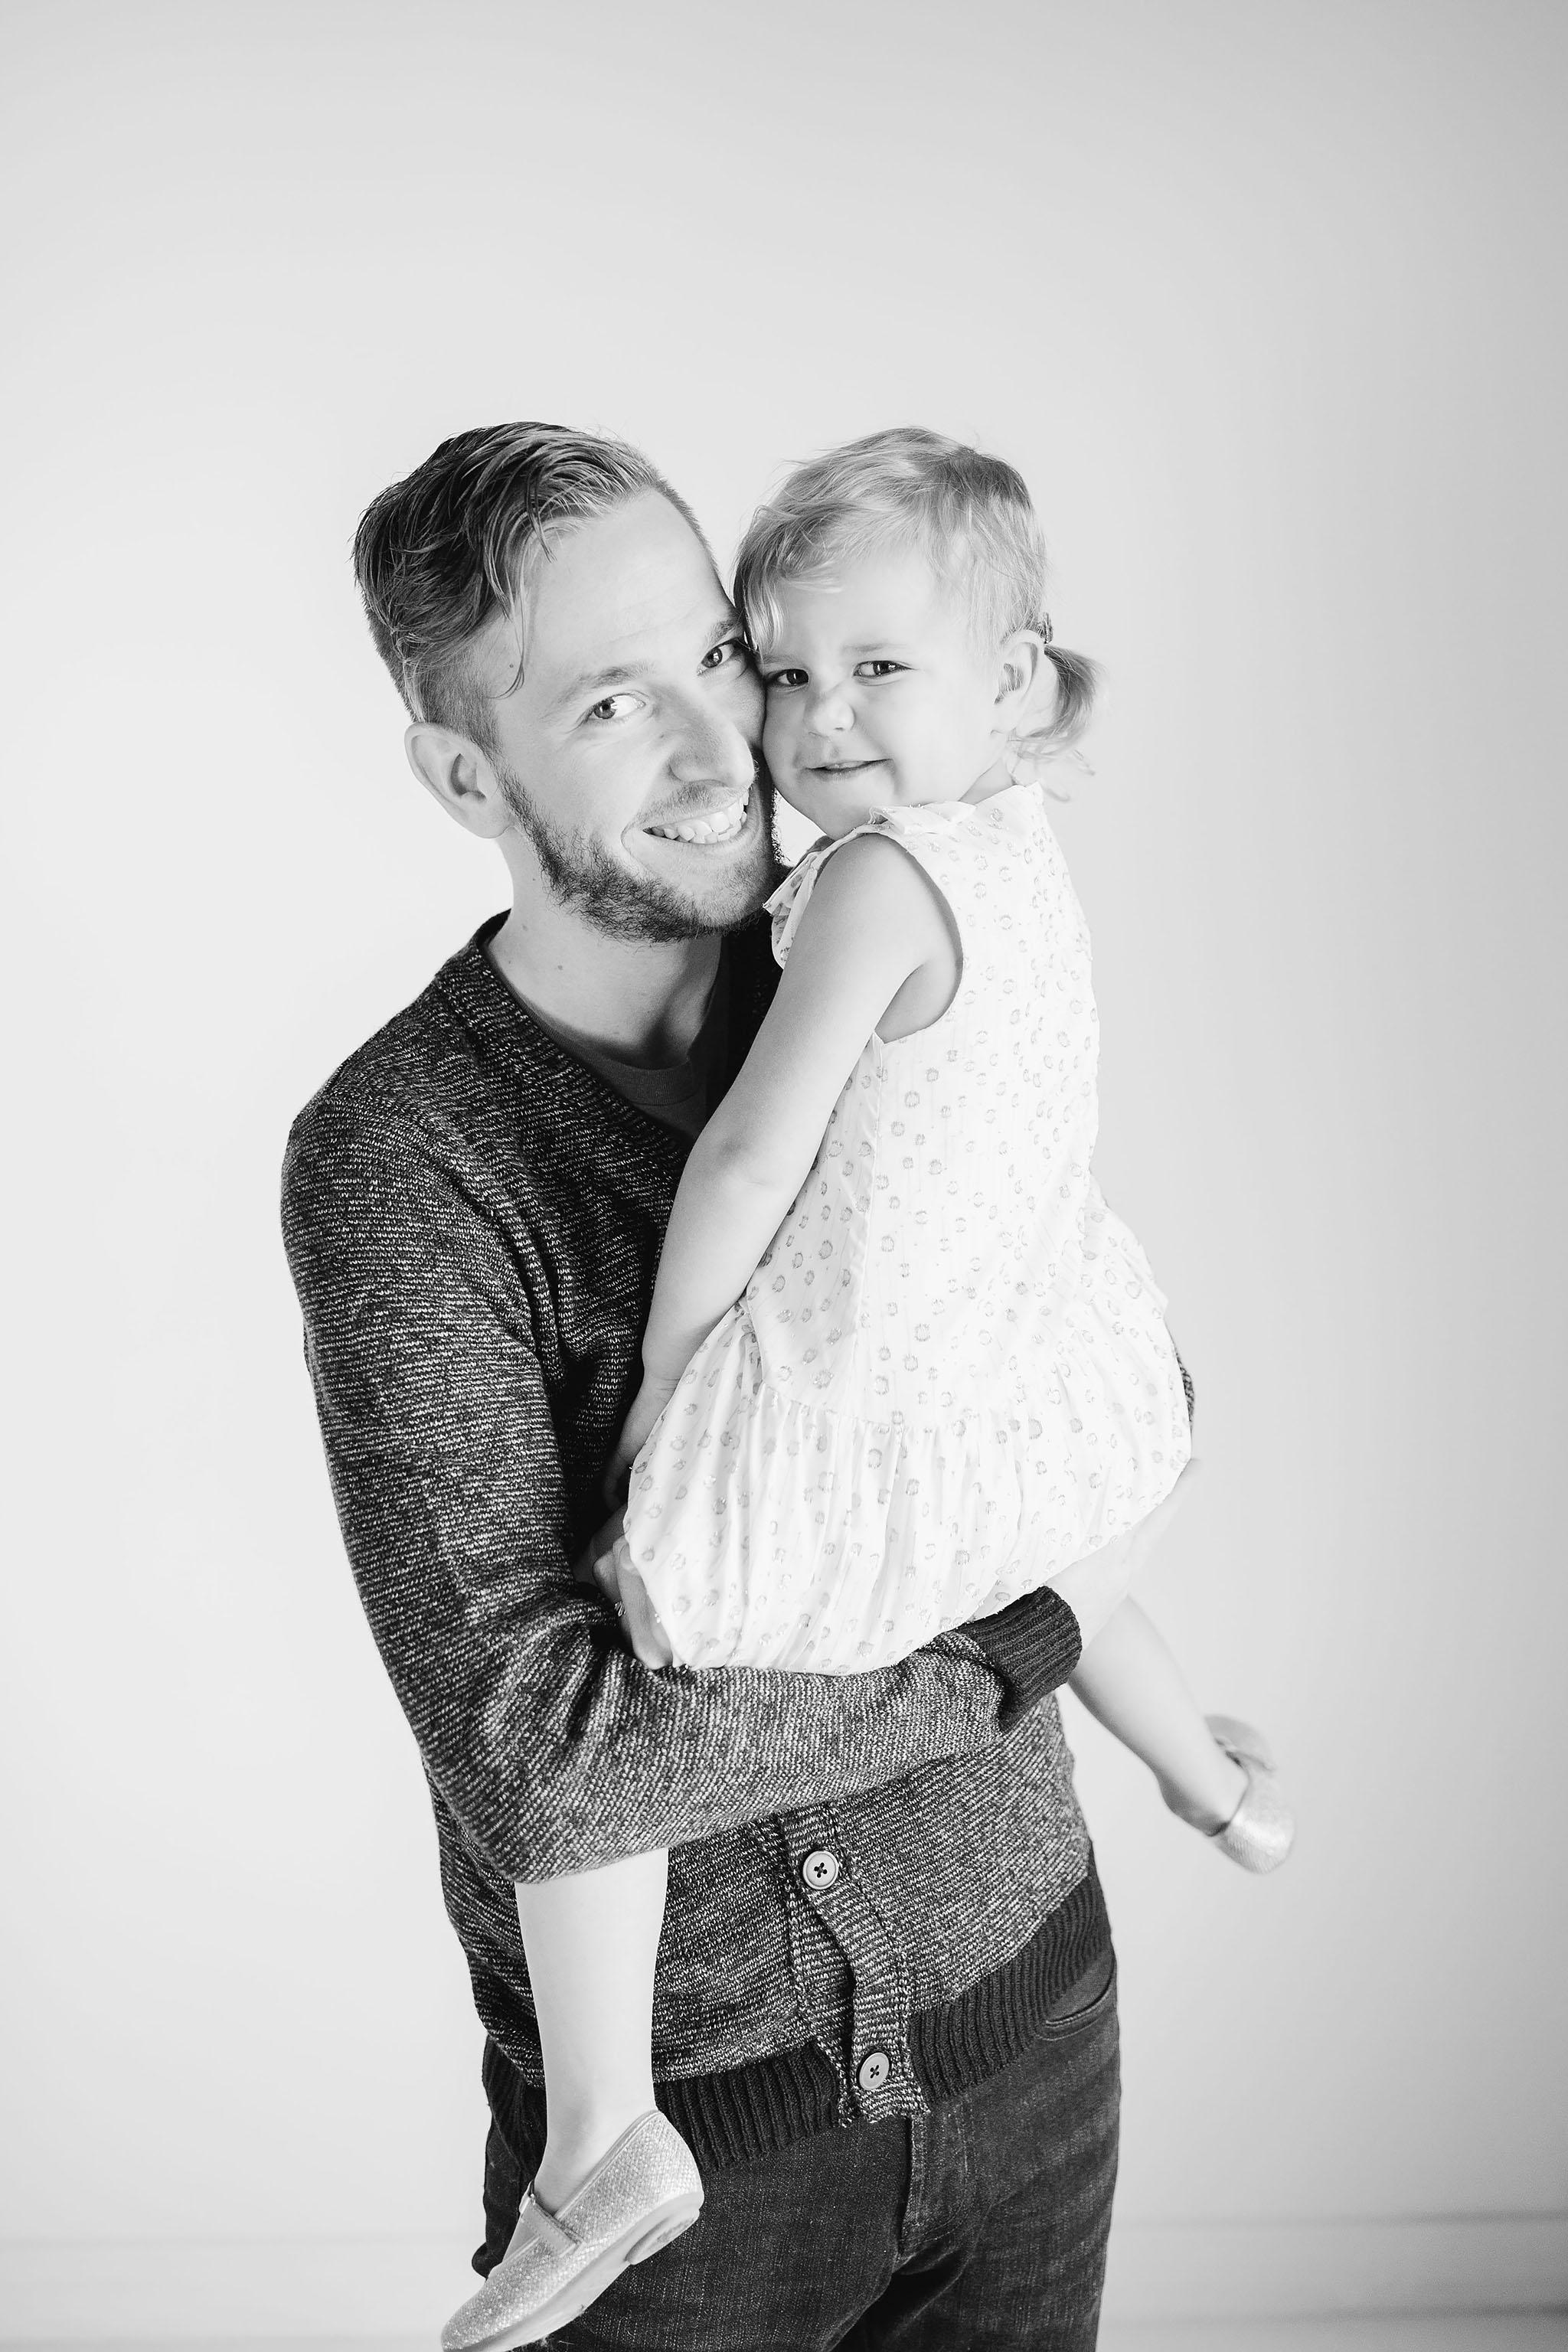 london_ontario_family_photographer-studio_photography-studio_lifestyle_portraits-white_studio-mother_son-candid_family_photography-raw_footage_photography043.jpg